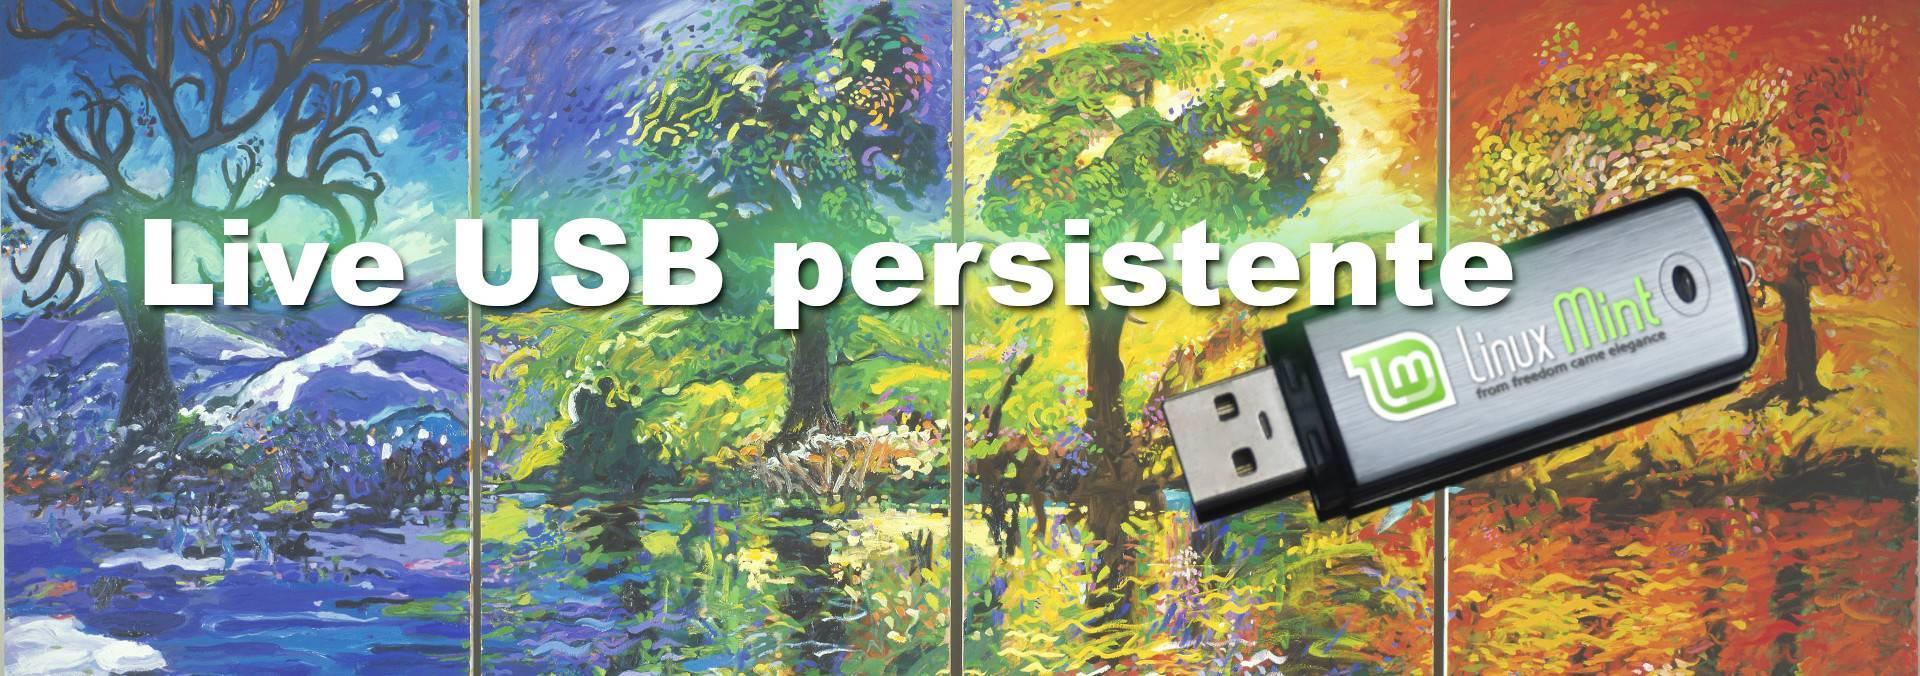 Live USB persistente con Linux Mint